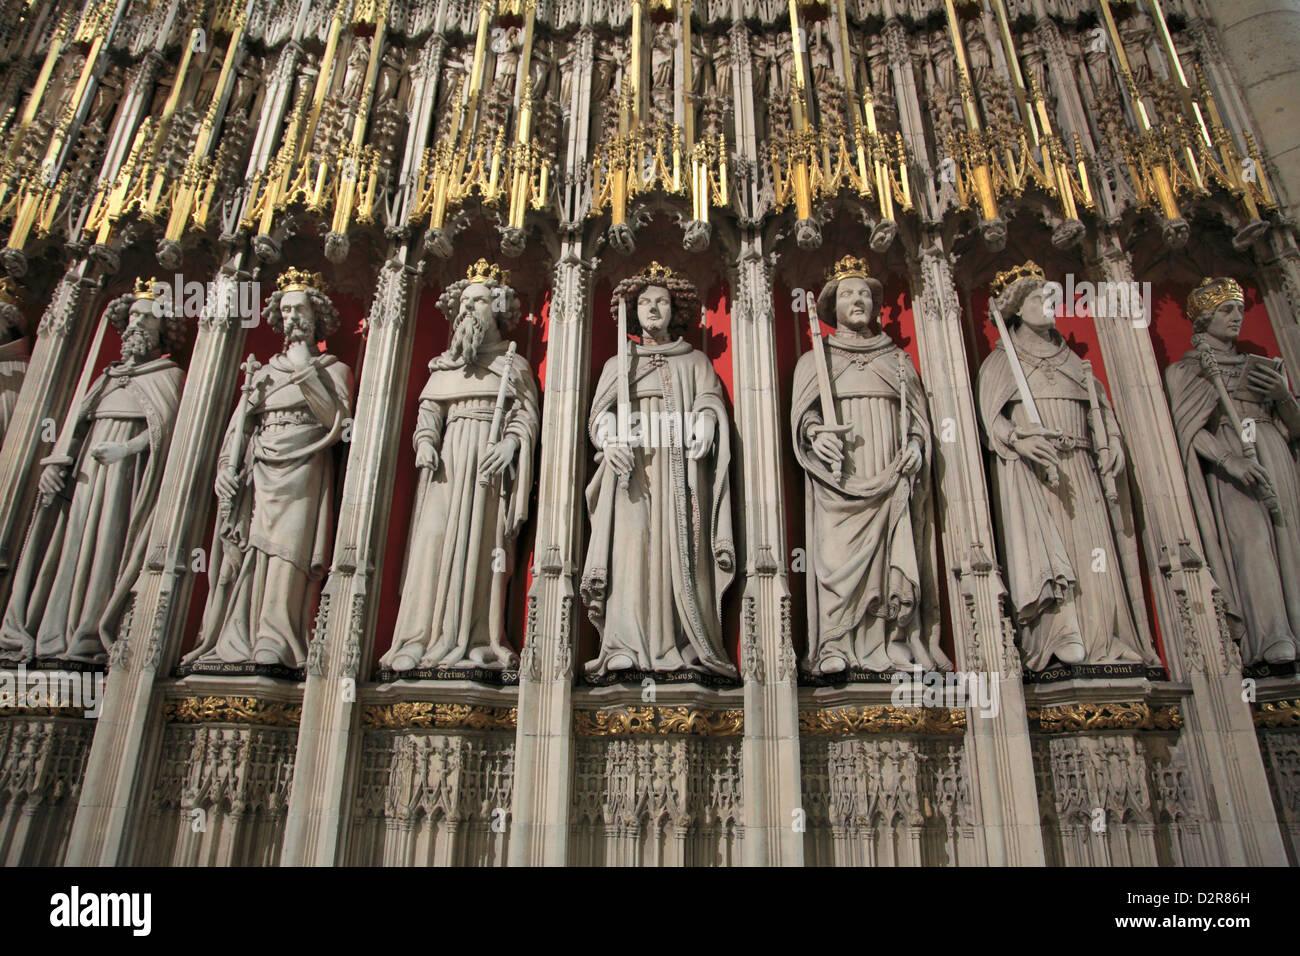 Statues de saints, York Minster, York, Yorkshire, Angleterre, Royaume-Uni, Europe Photo Stock